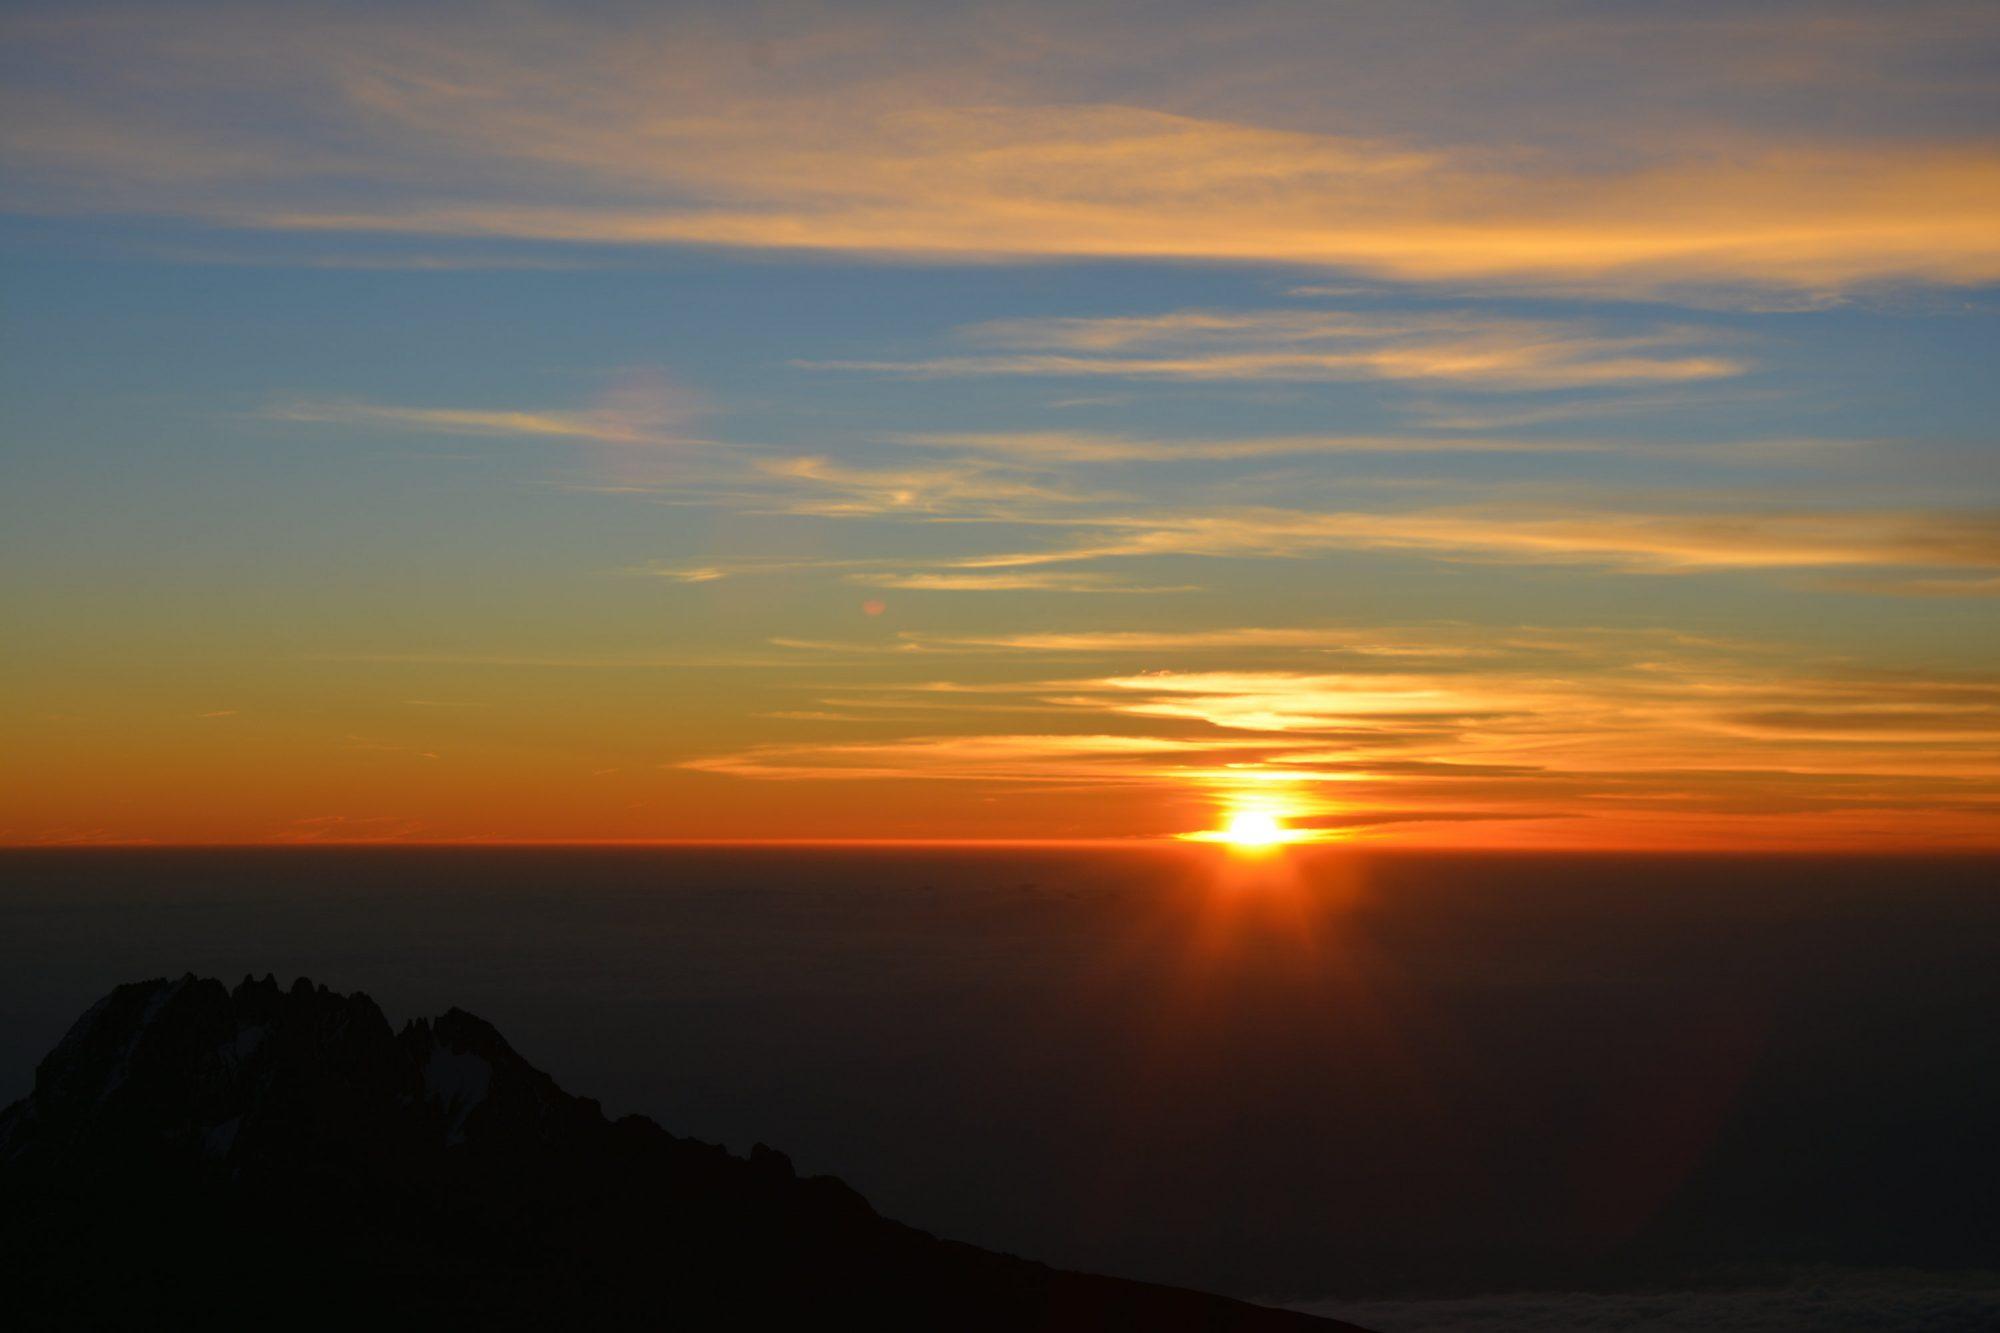 Sonnenaufgang am Dach Afrikas, Kilimandscharo, Kilimandscharo besteigen, Tansania, Afrika, Kilimandscharo Tour, Erfahrungsbericht, Machame Route